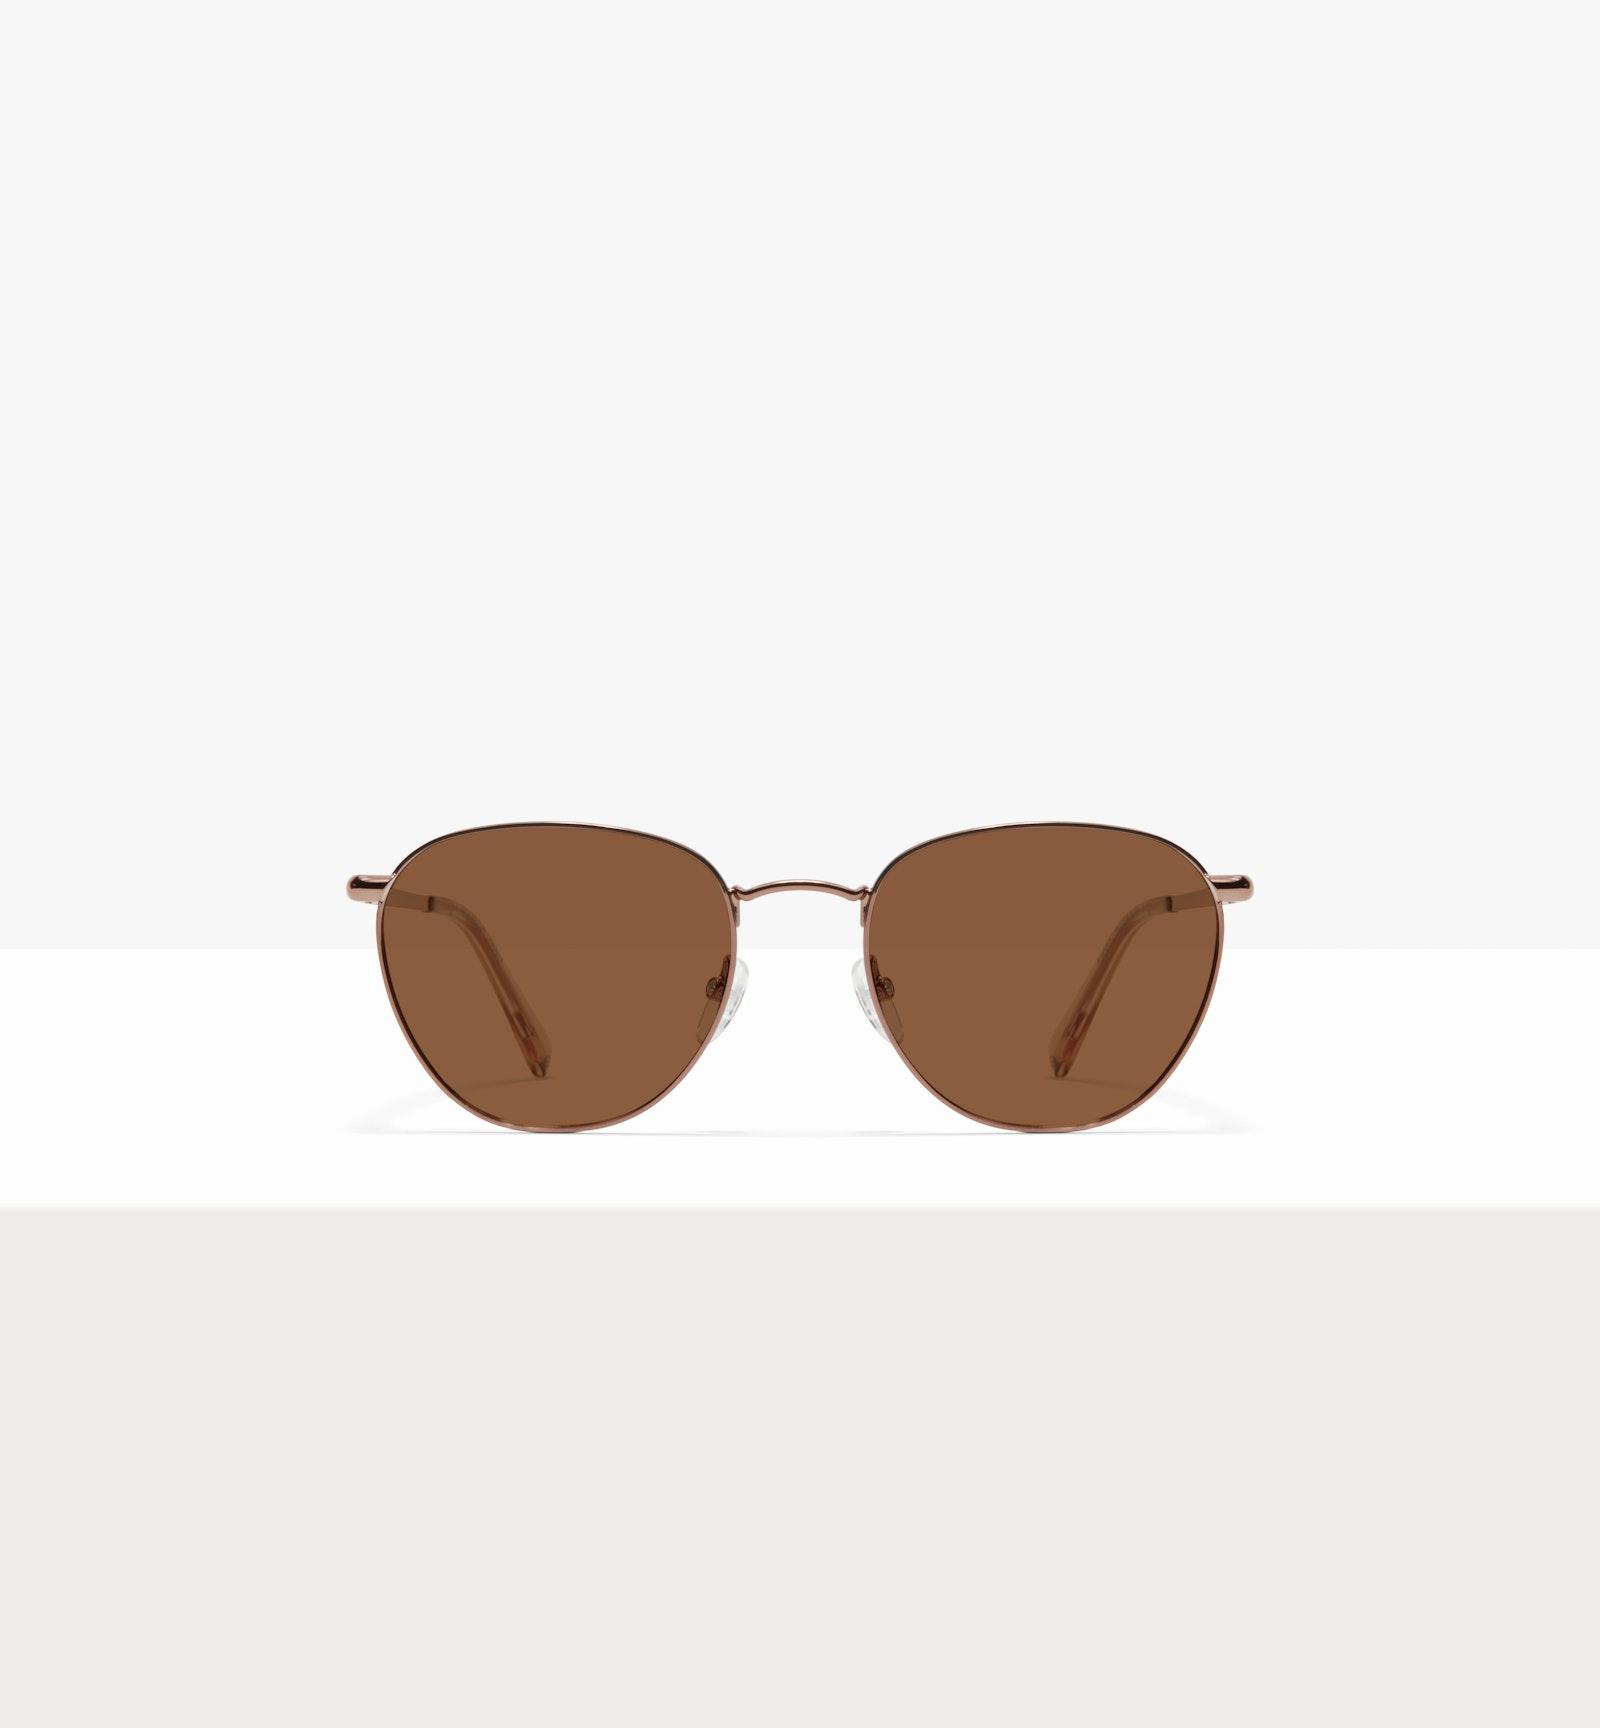 Affordable Fashion Glasses Round Sunglasses Women Radiant L Copper